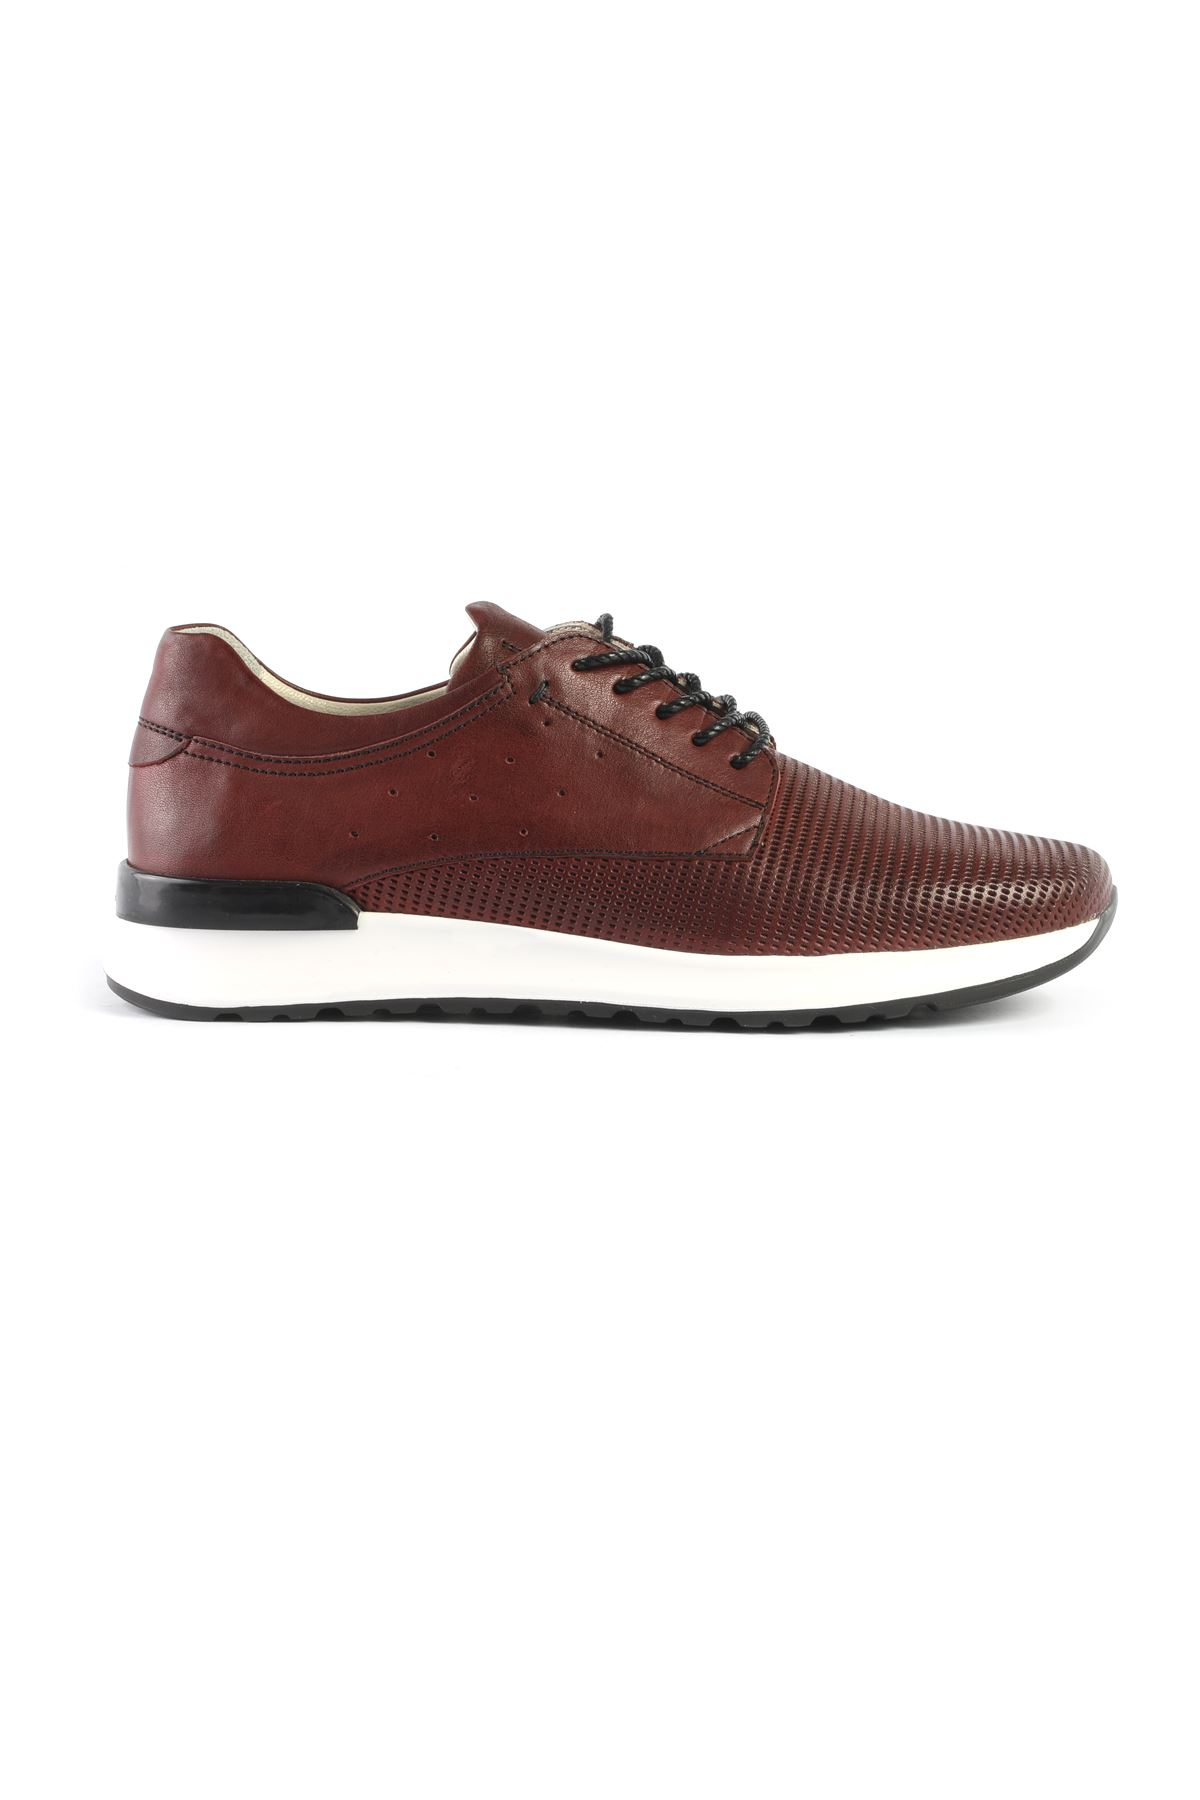 Libero 3046 Claret Red Sport Shoes